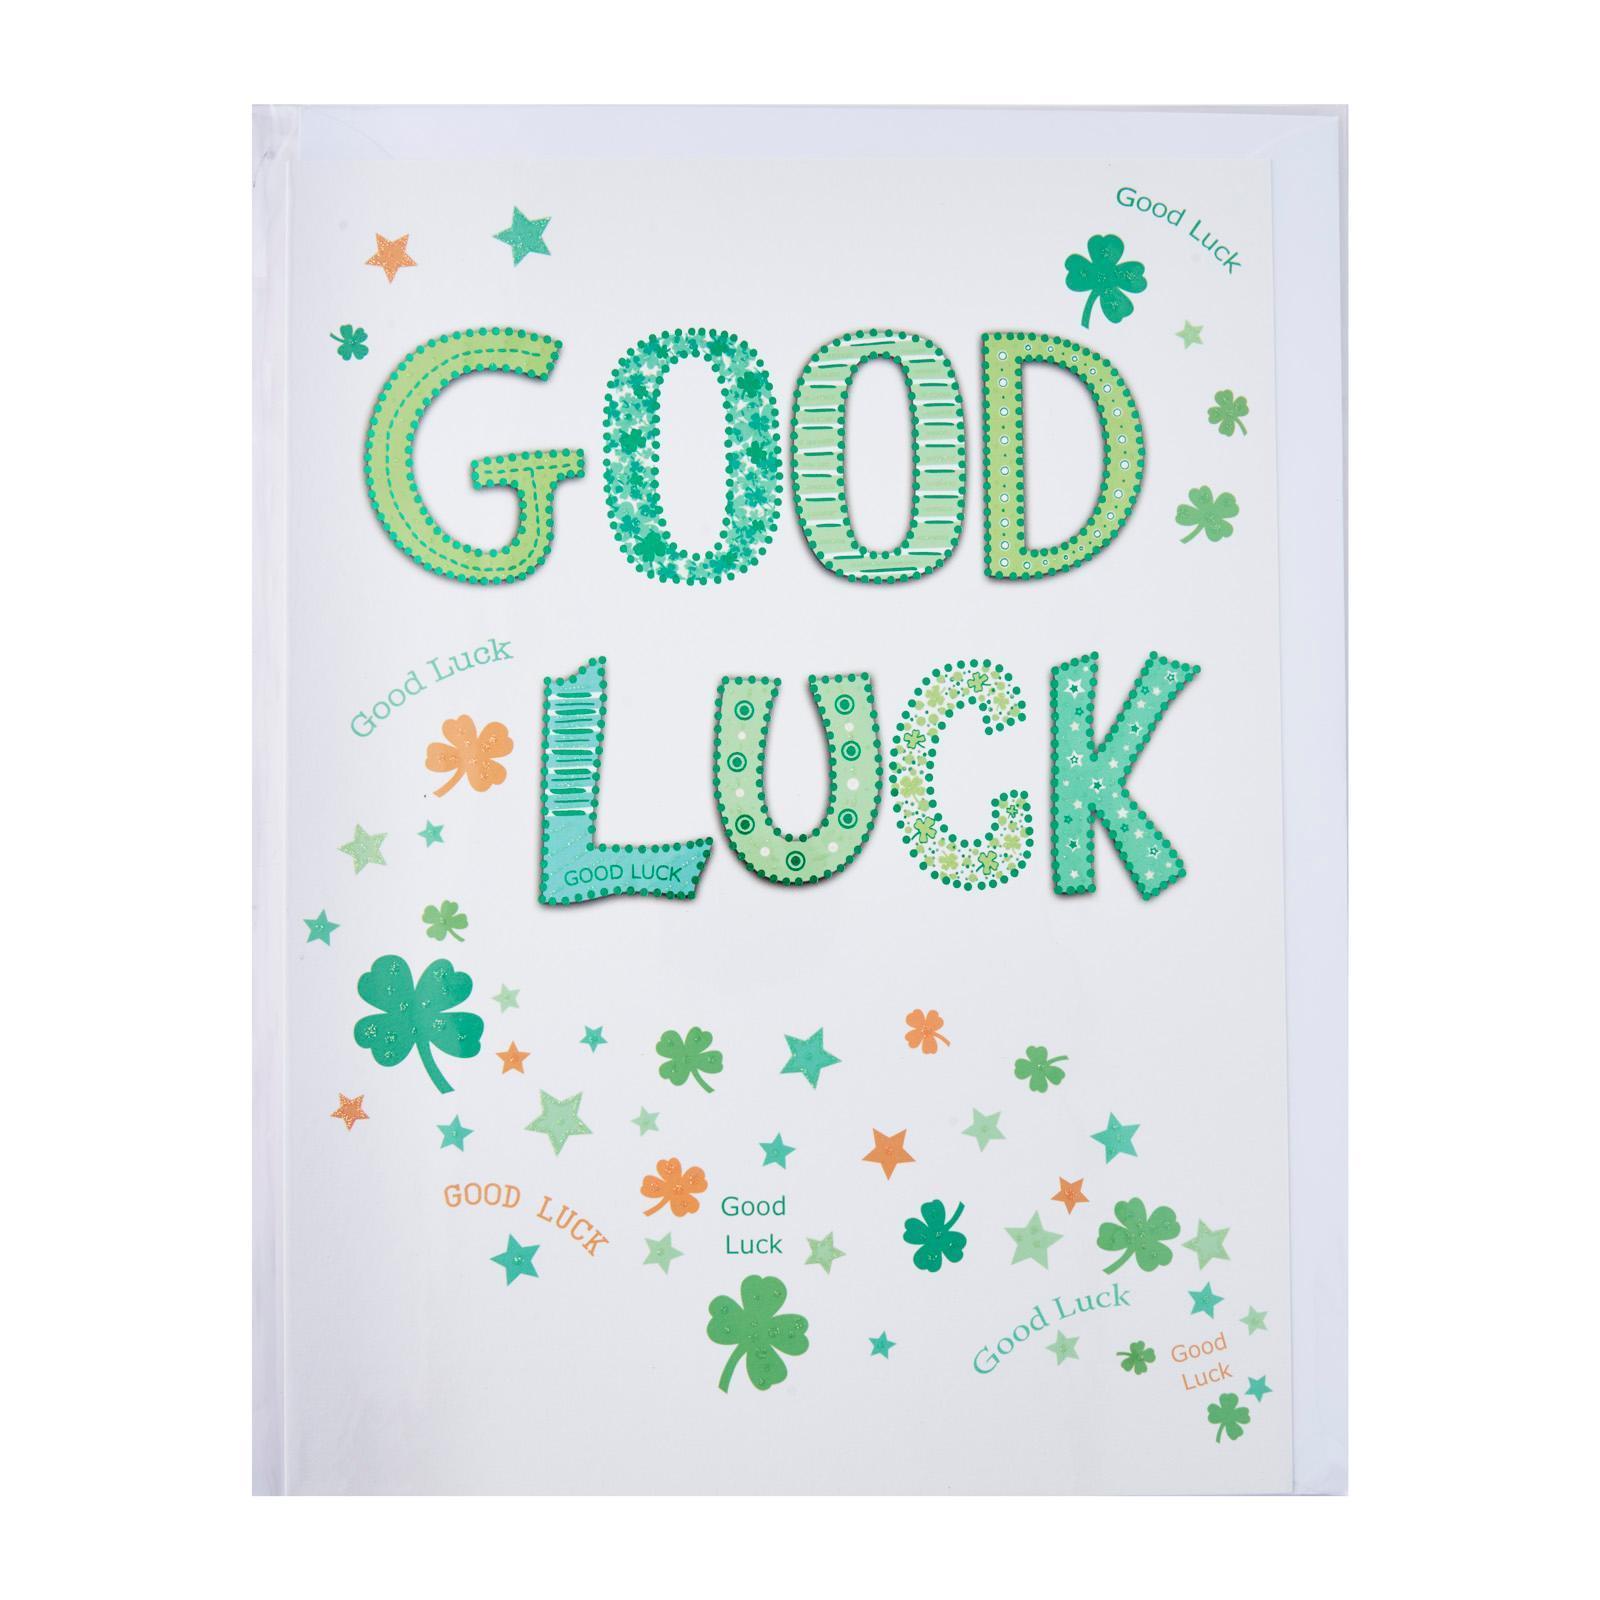 Goldmark Farewell Card Good Luck Diffmarts Singapore